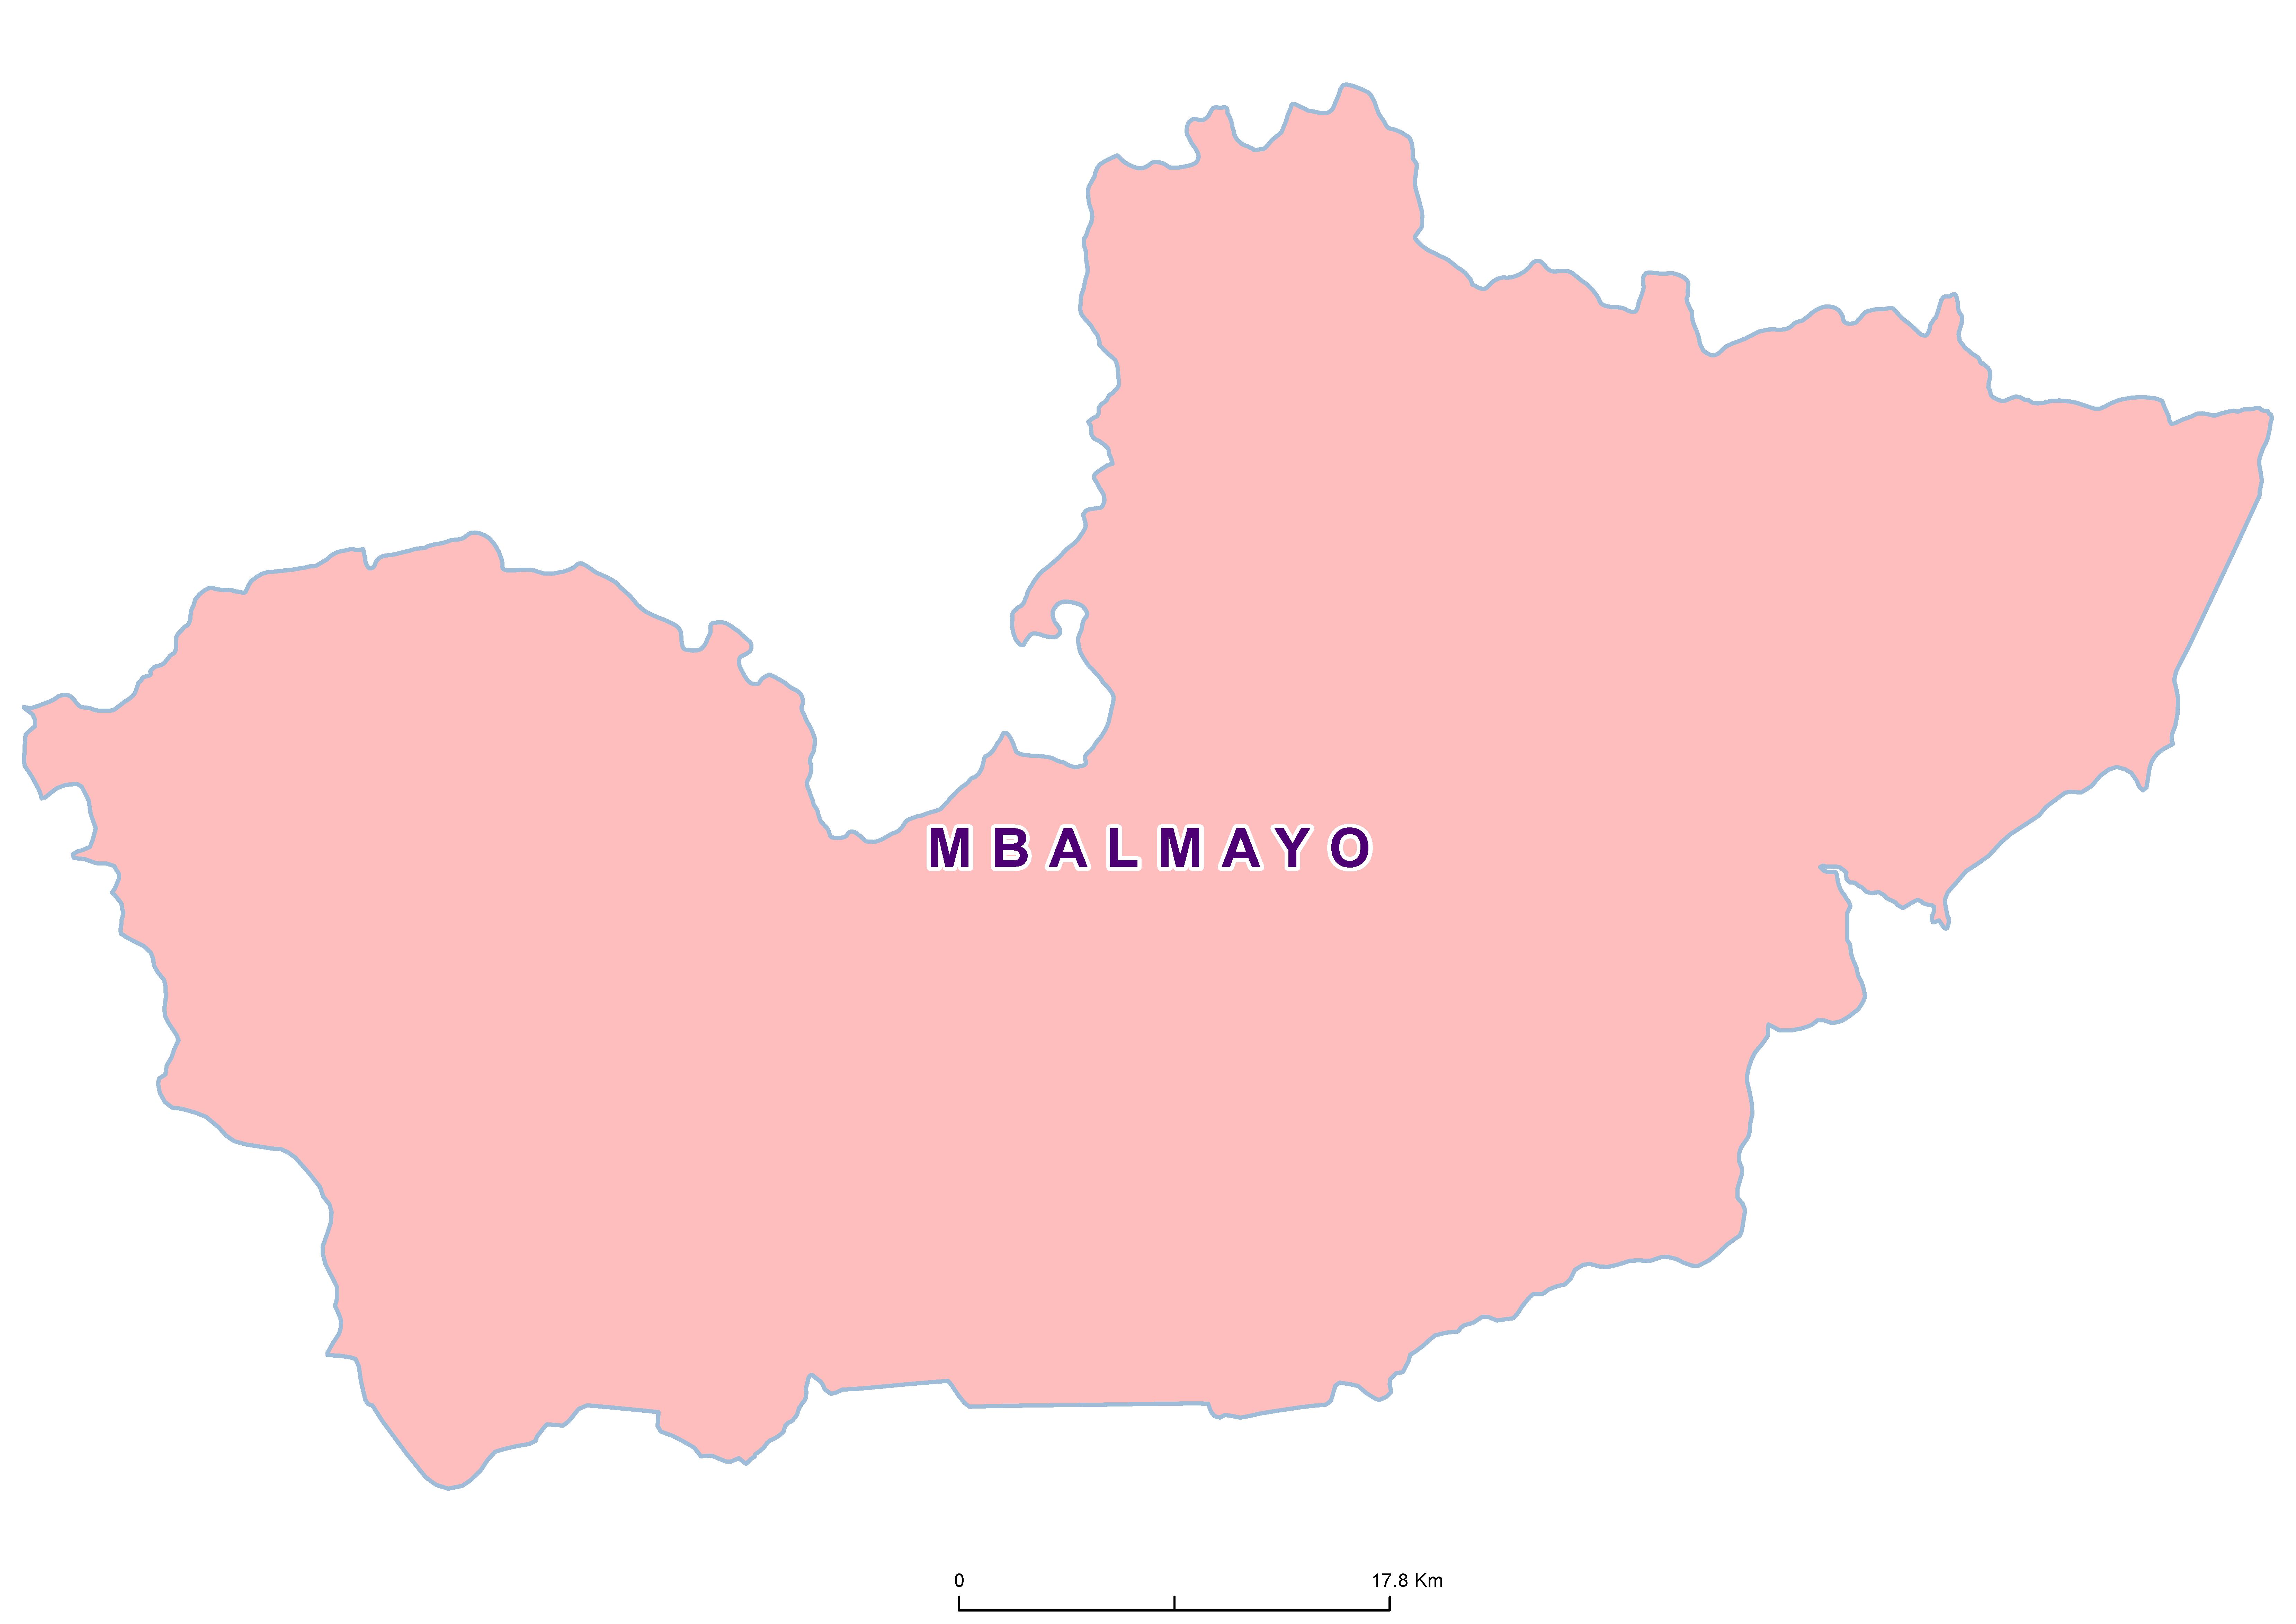 Mbalmayo Max SCH 19850001